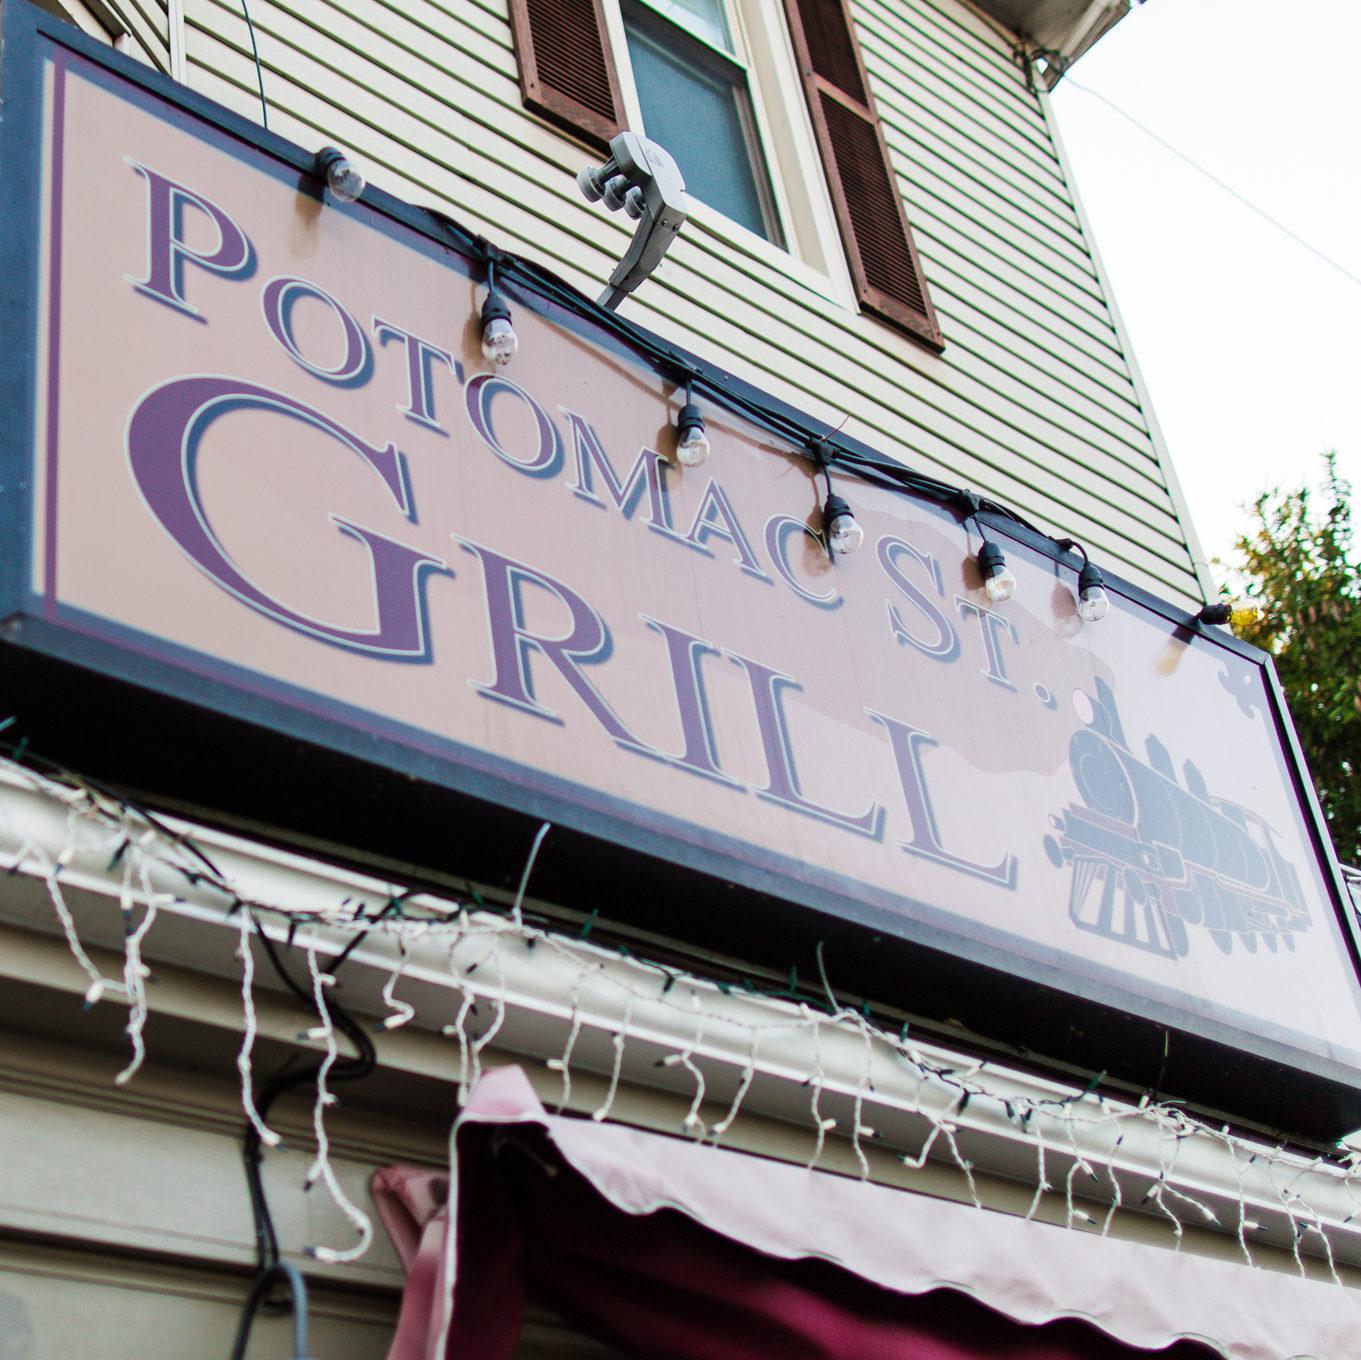 Potomac Street Grill